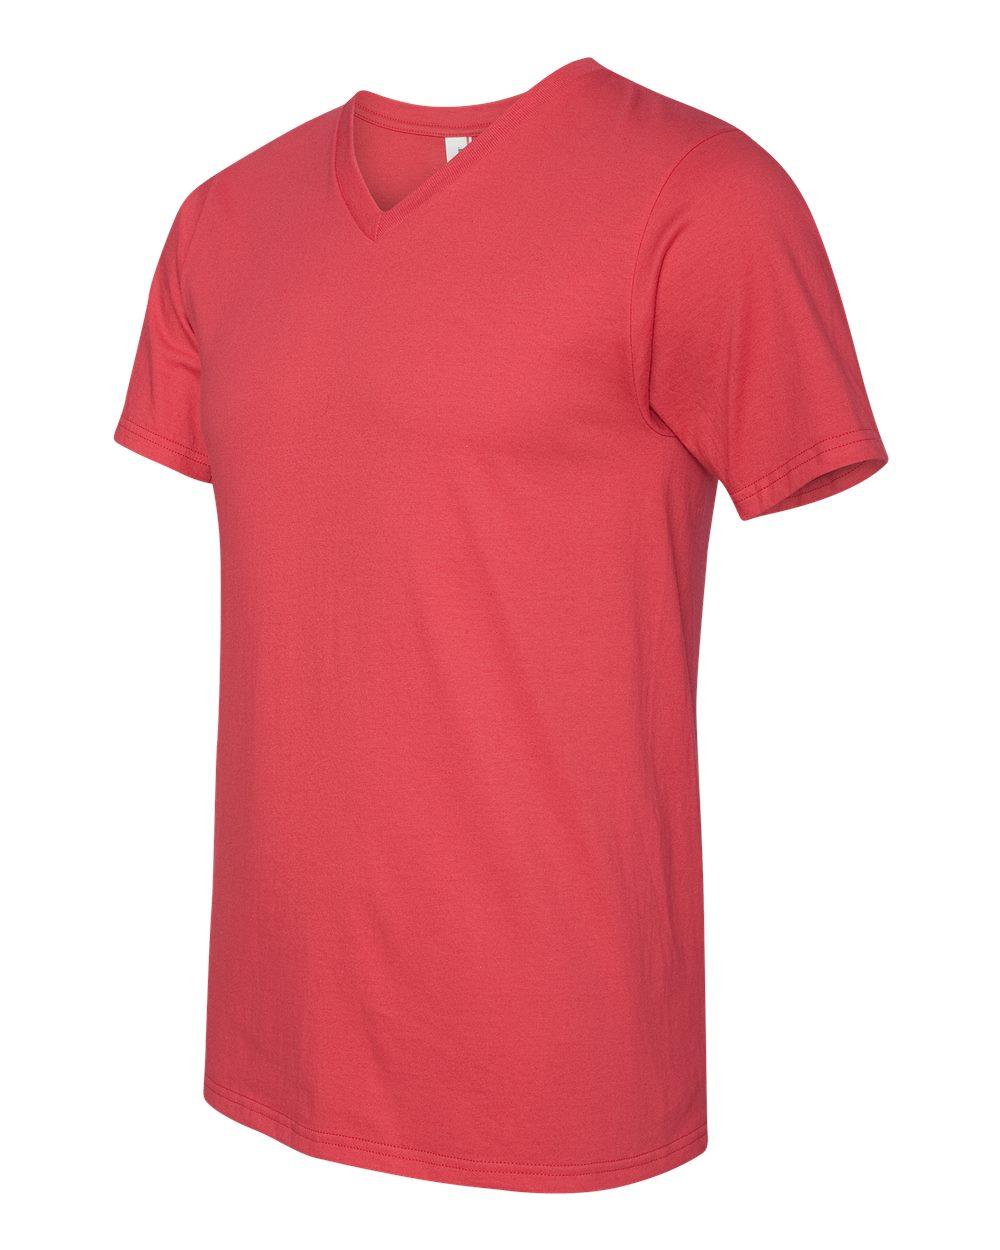 Anvil-Men-039-s-Lightweight-V-Neck-T-Shirt-982-S-3XL thumbnail 21